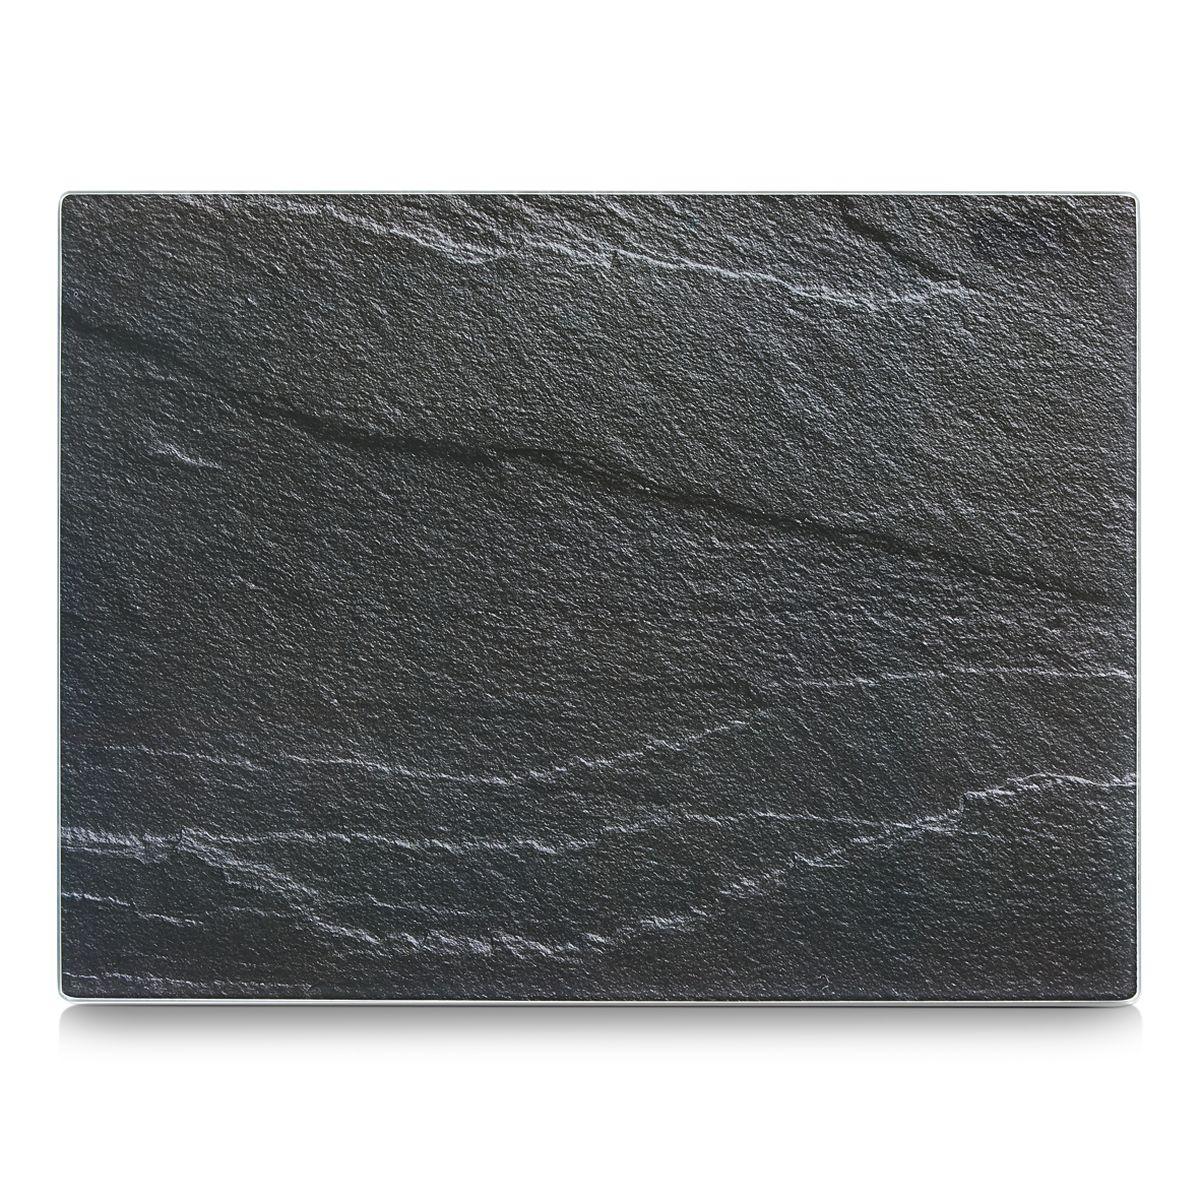 Доска разделочная Zeller, 40 х 30 см26257